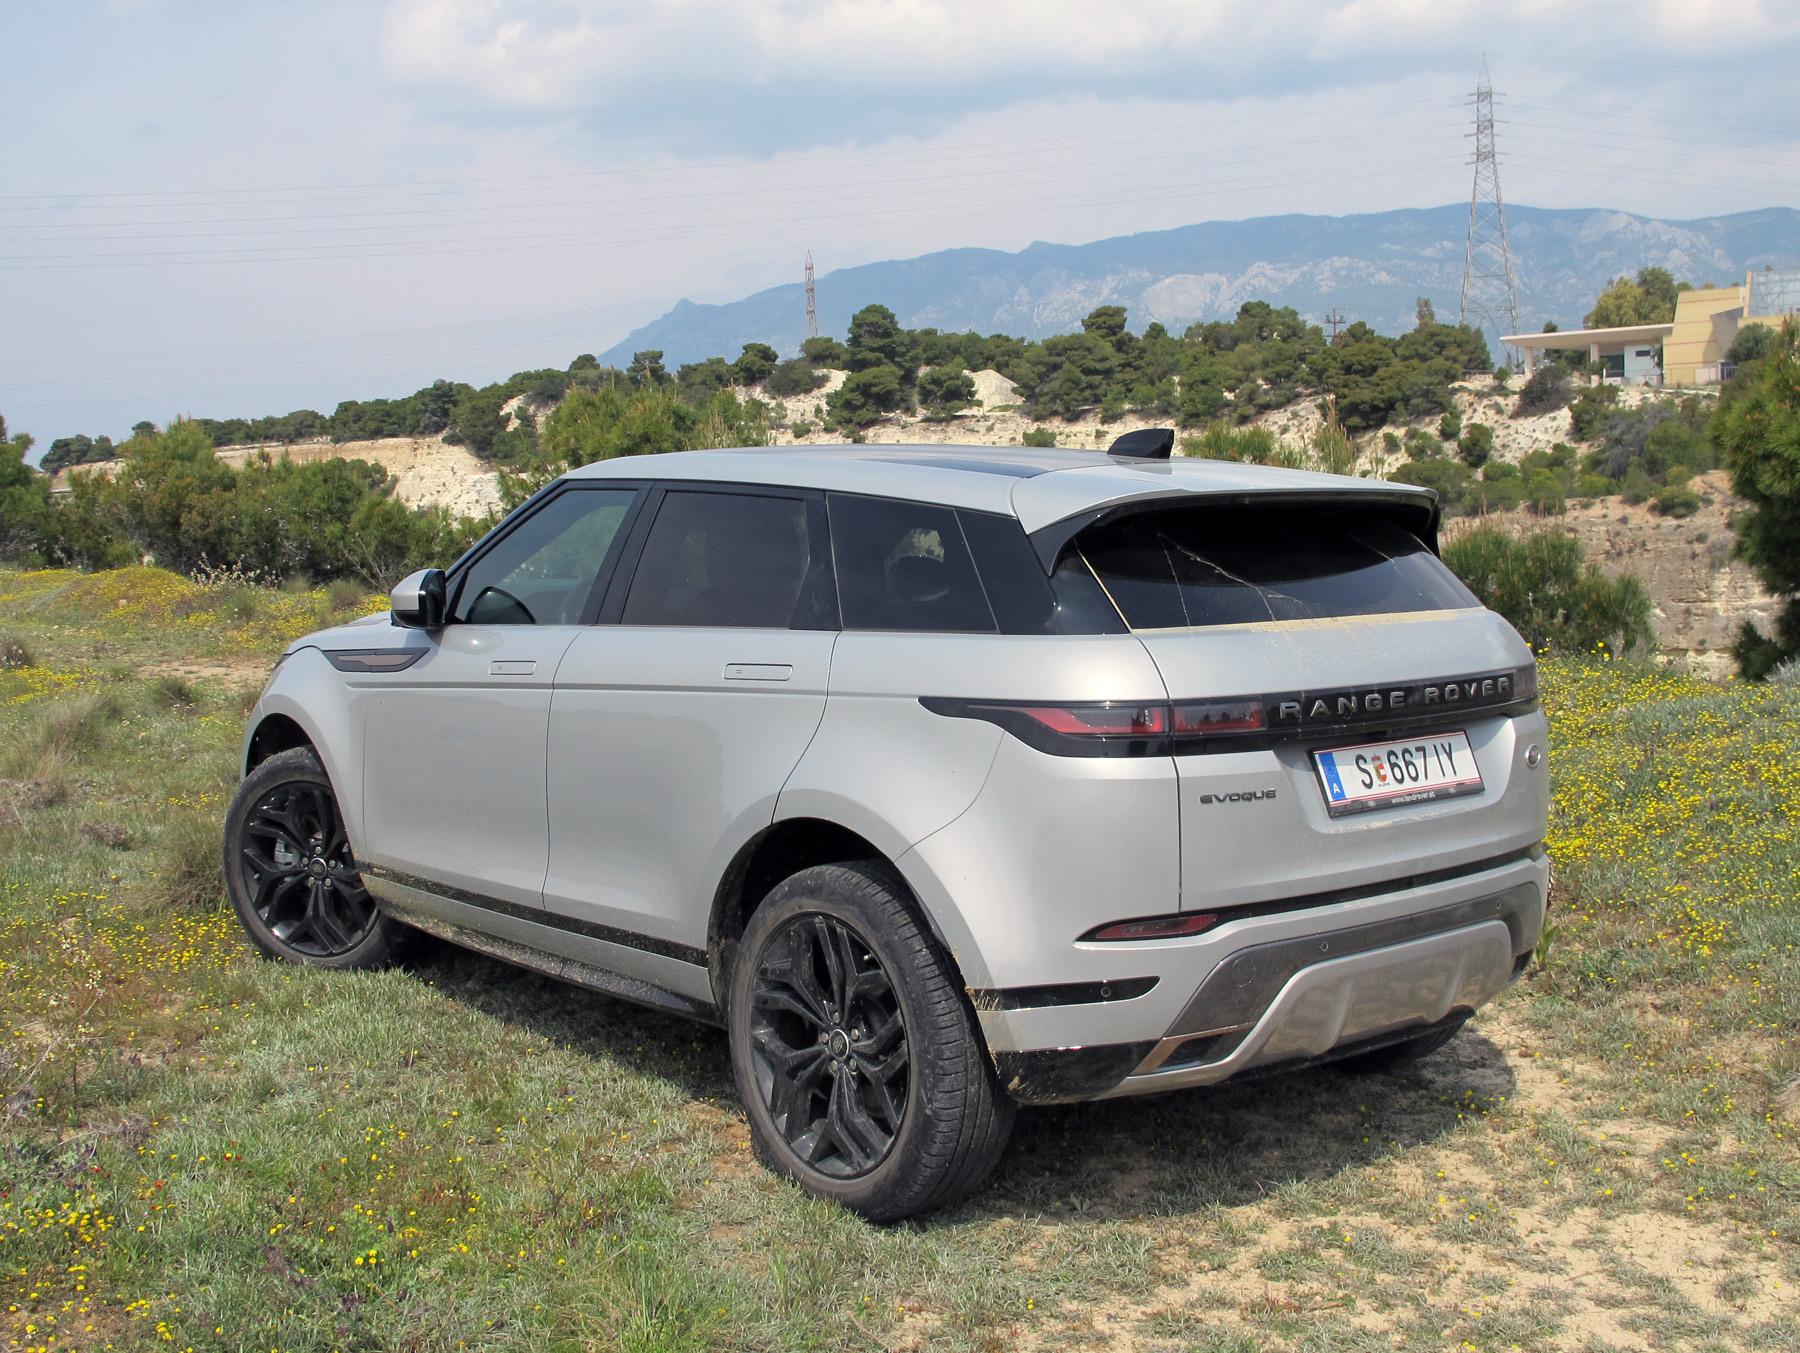 First Drive: 2020 Range Rover Evoque – WHEELS ca